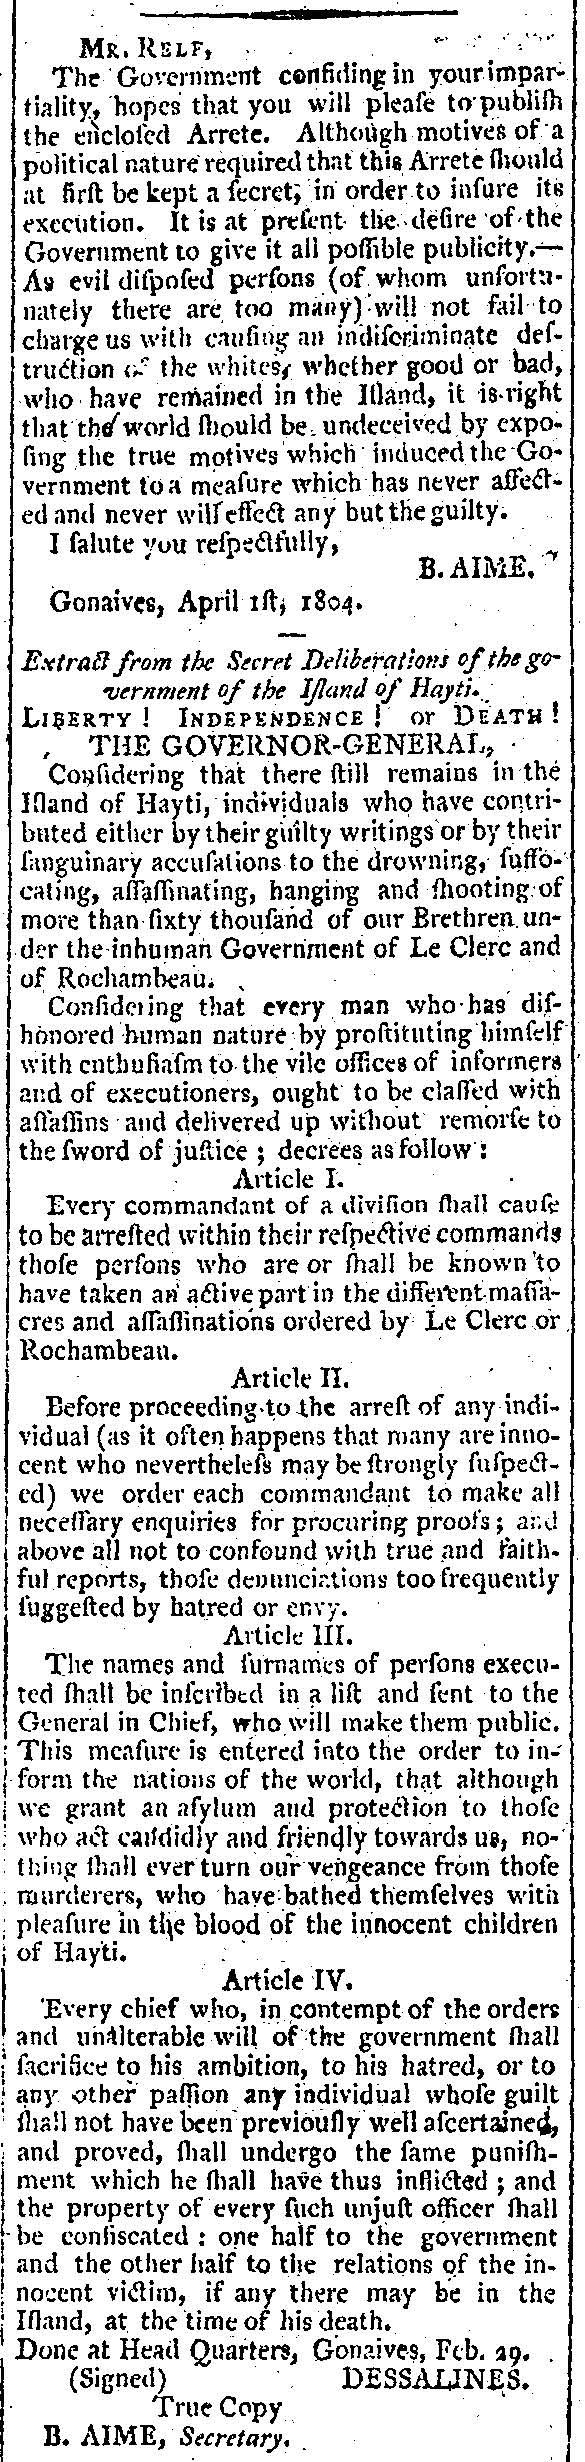 Dessalines Reader, 1 April 1804 (2)